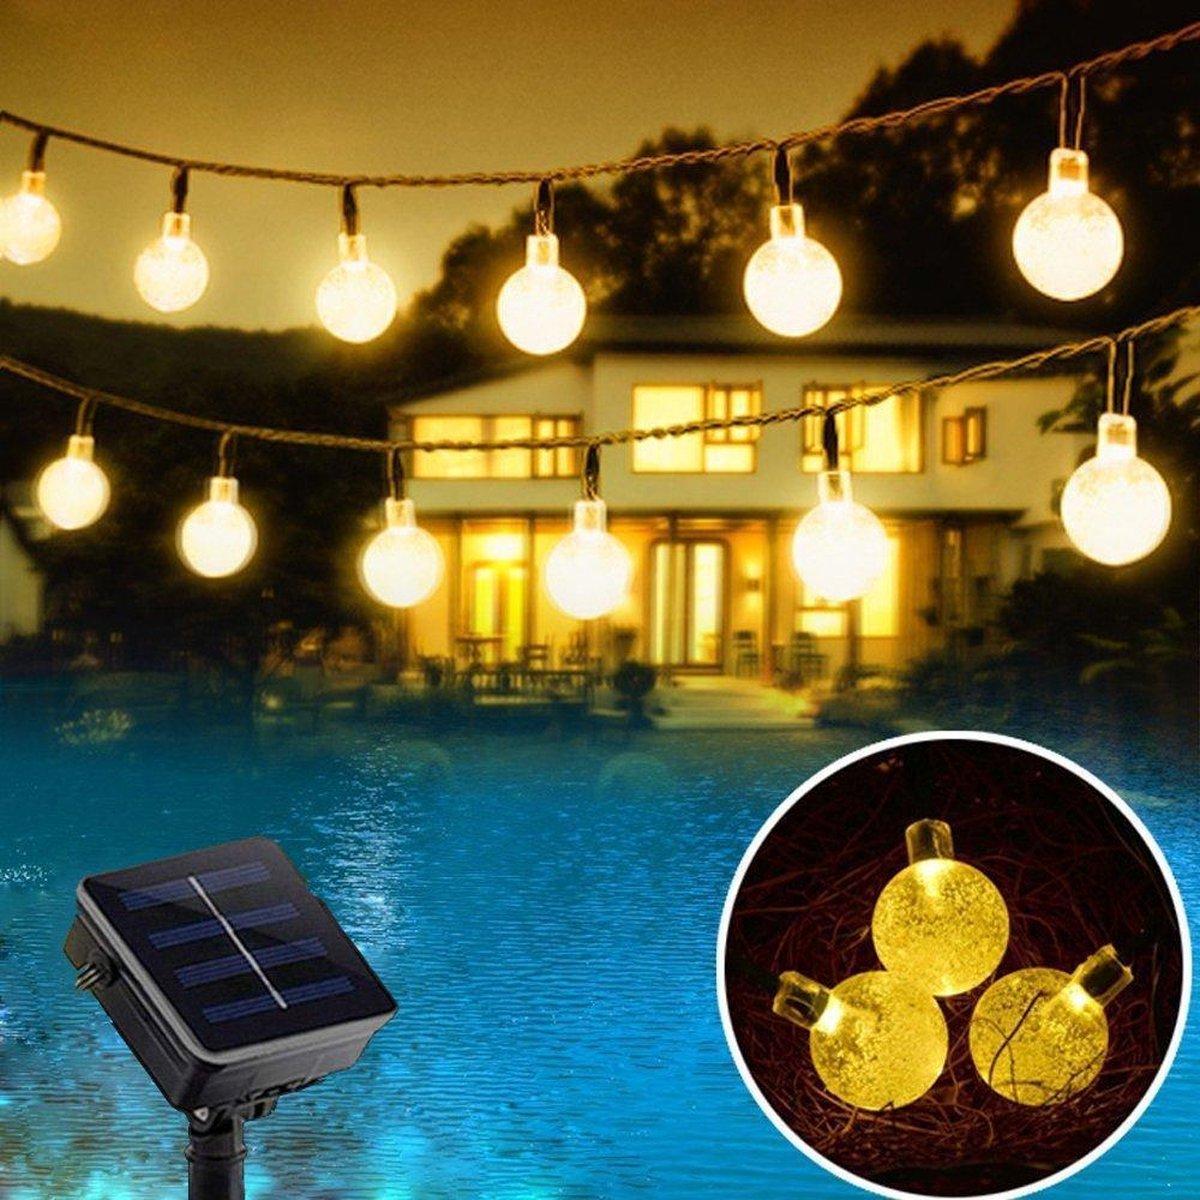 J-Pro Tuinverlichting op zonne-energie - 20 Solar LED 5m Cristal lichtsnoer - ø2,5cm